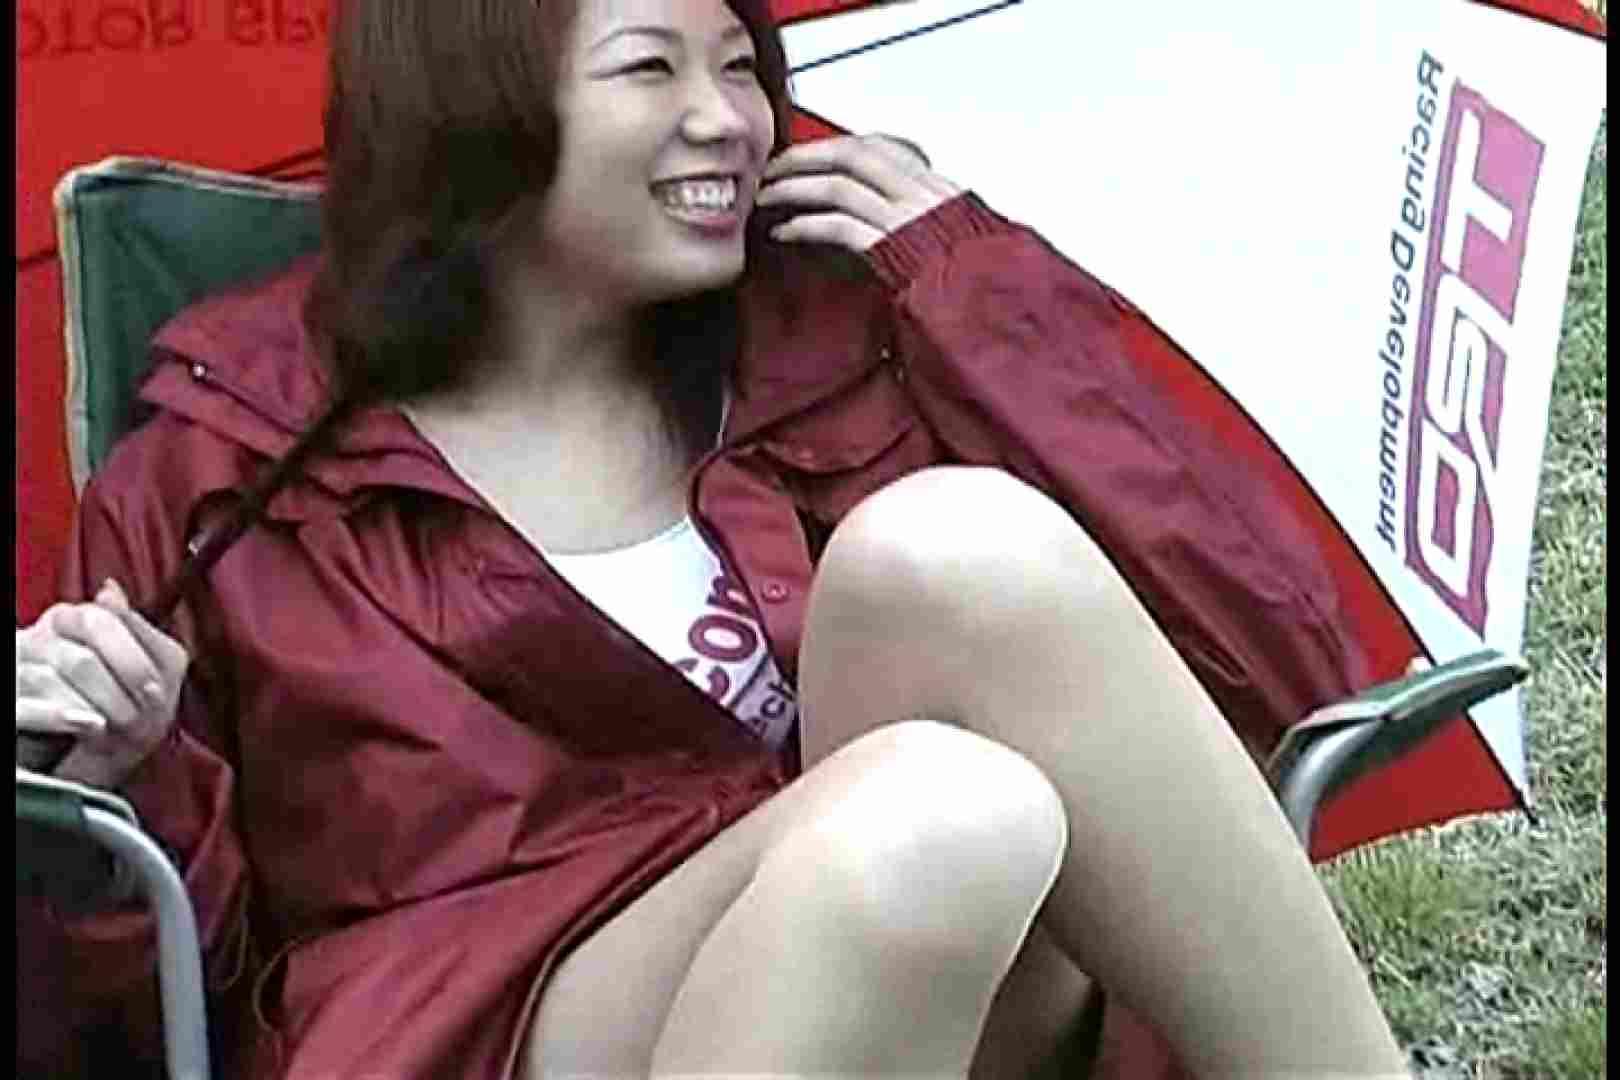 RQカメラ地獄Vol.3 美女OL   レースクイーン  83連発 79